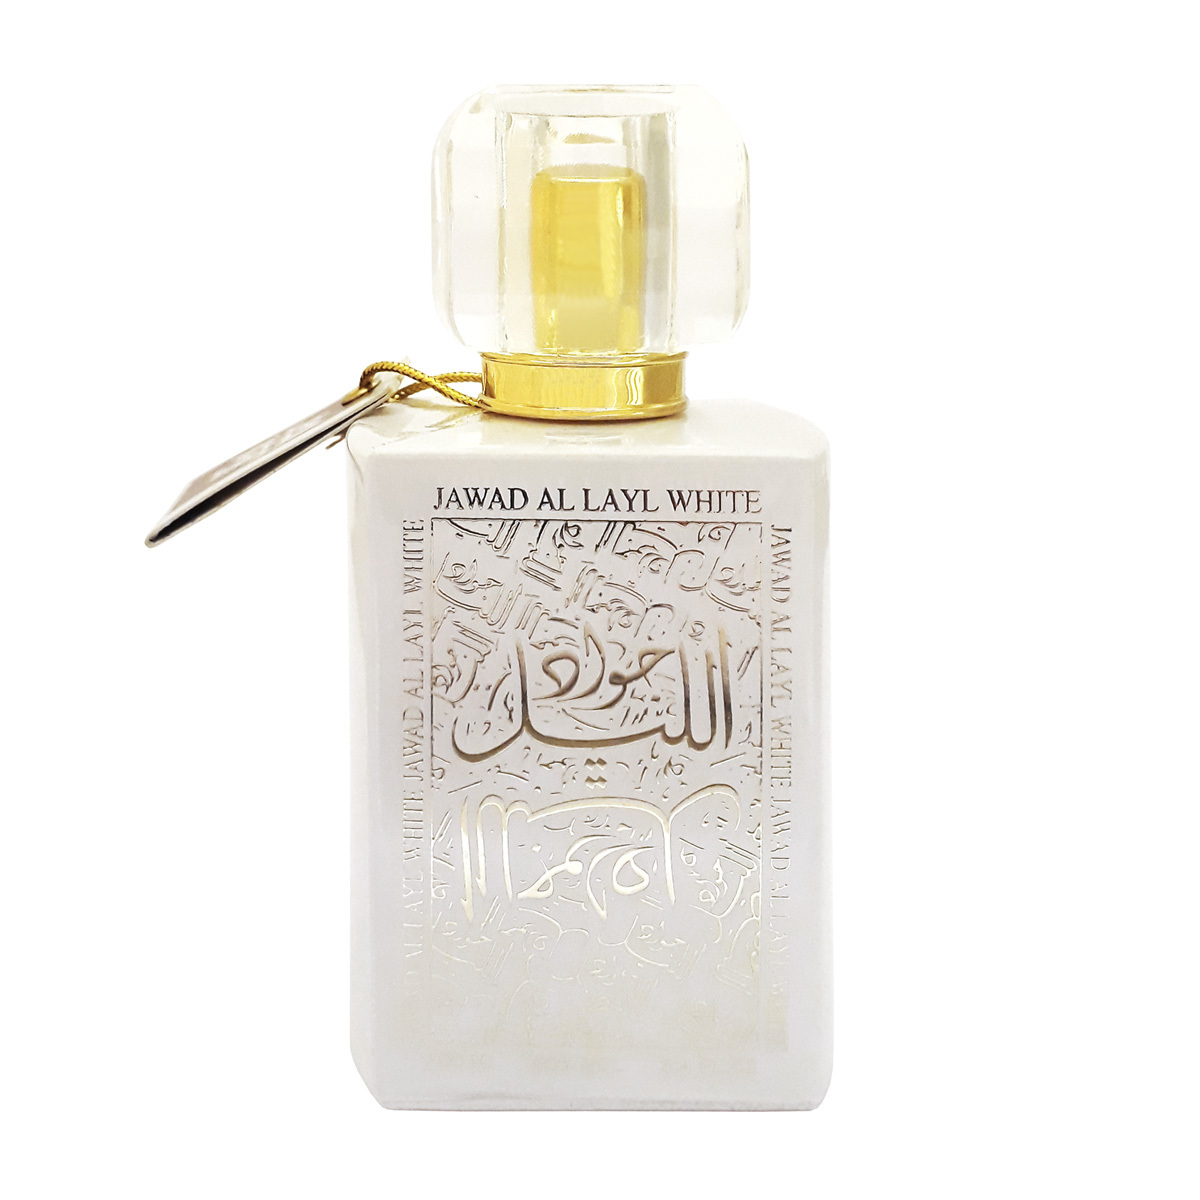 Jawad al Layl White / Джавад аль Лайл Белый 100 мл спрей от Халис Khalis Perfumes